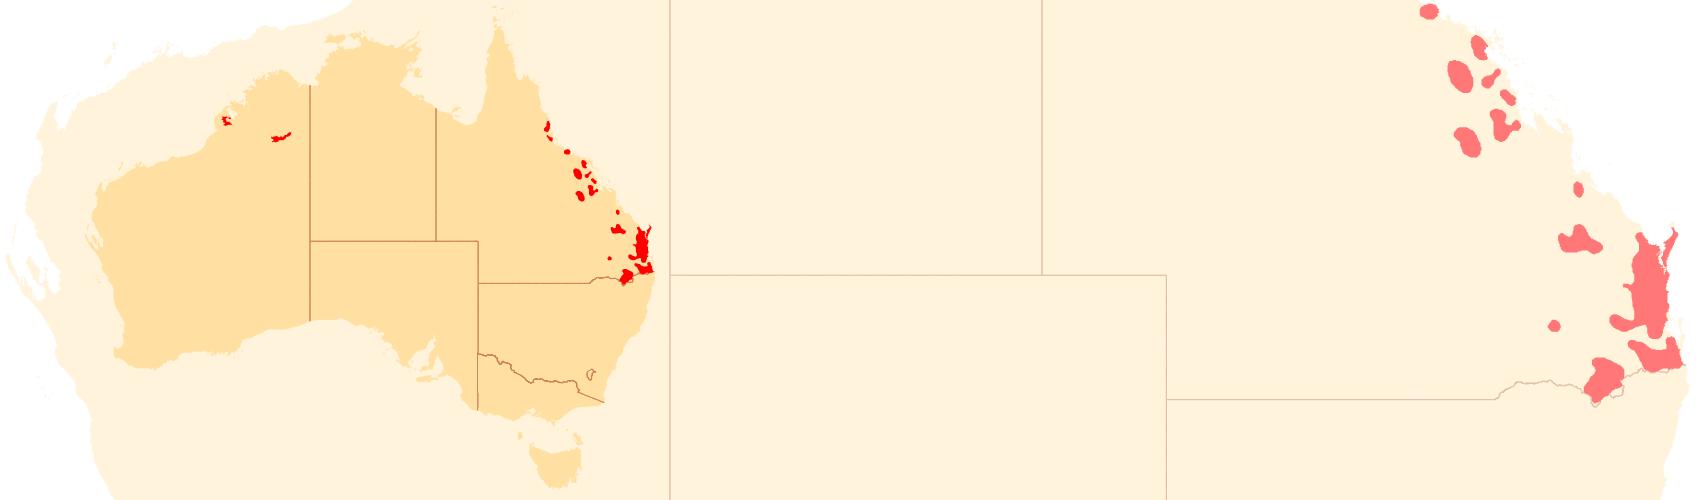 Australian Seasonal Bushfire Outlook 2020